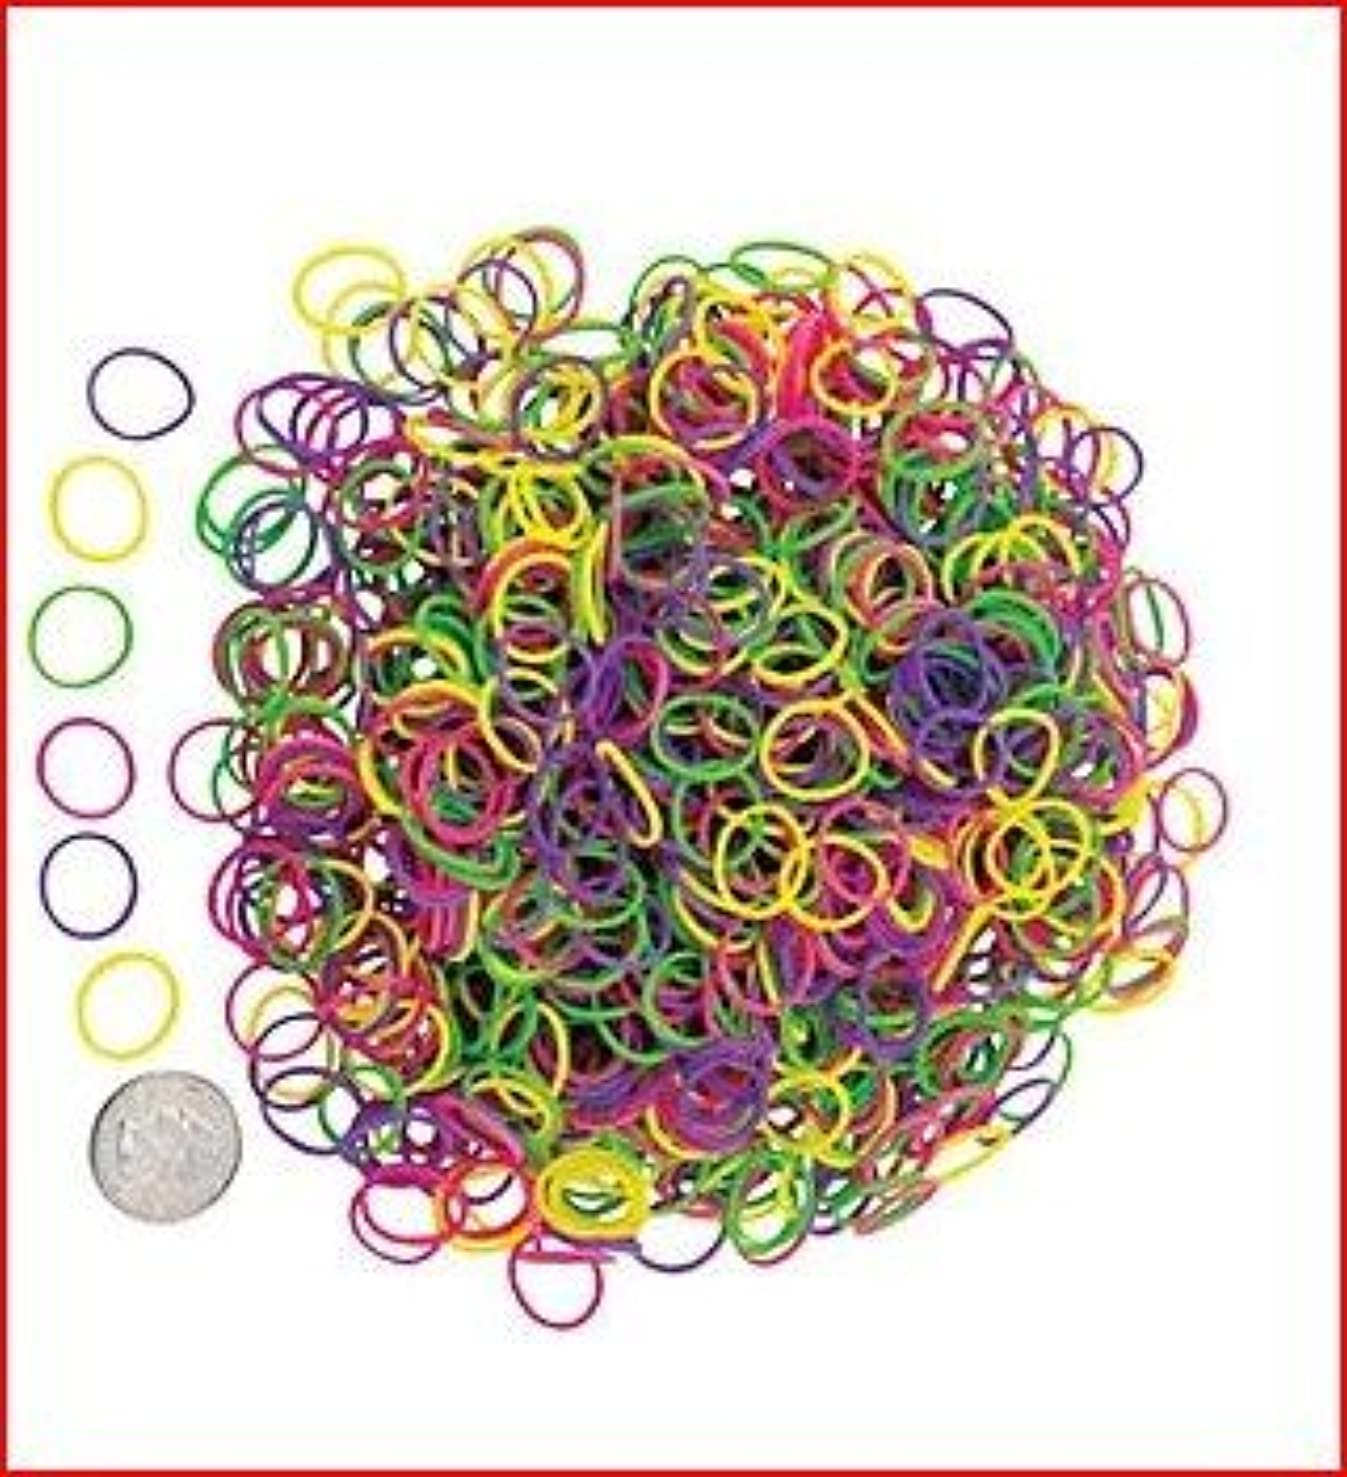 Pastel Soft Colors Looms Fun Loops Assortment Kit